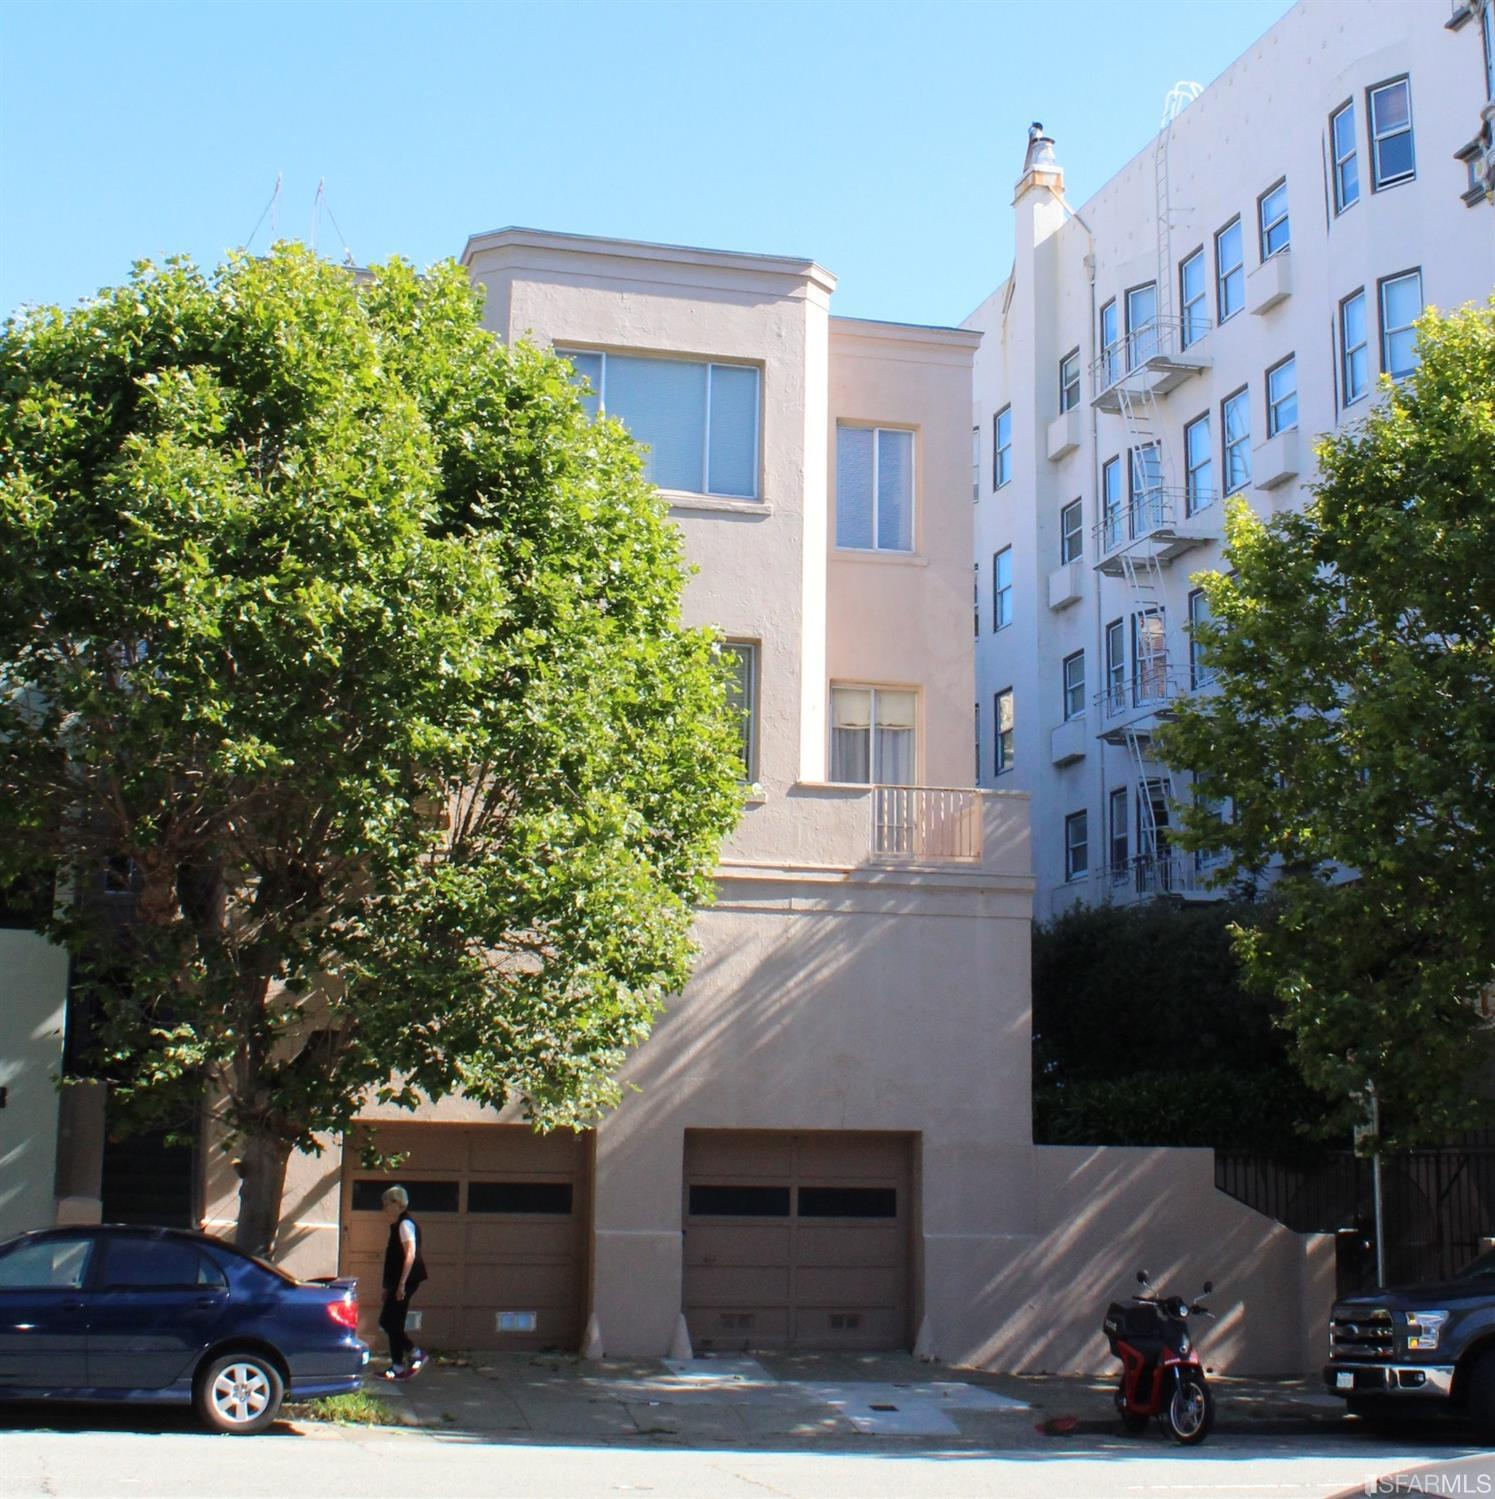 1910 California Street, San Francisco, CA 94109, MLS # 488343 | Compass